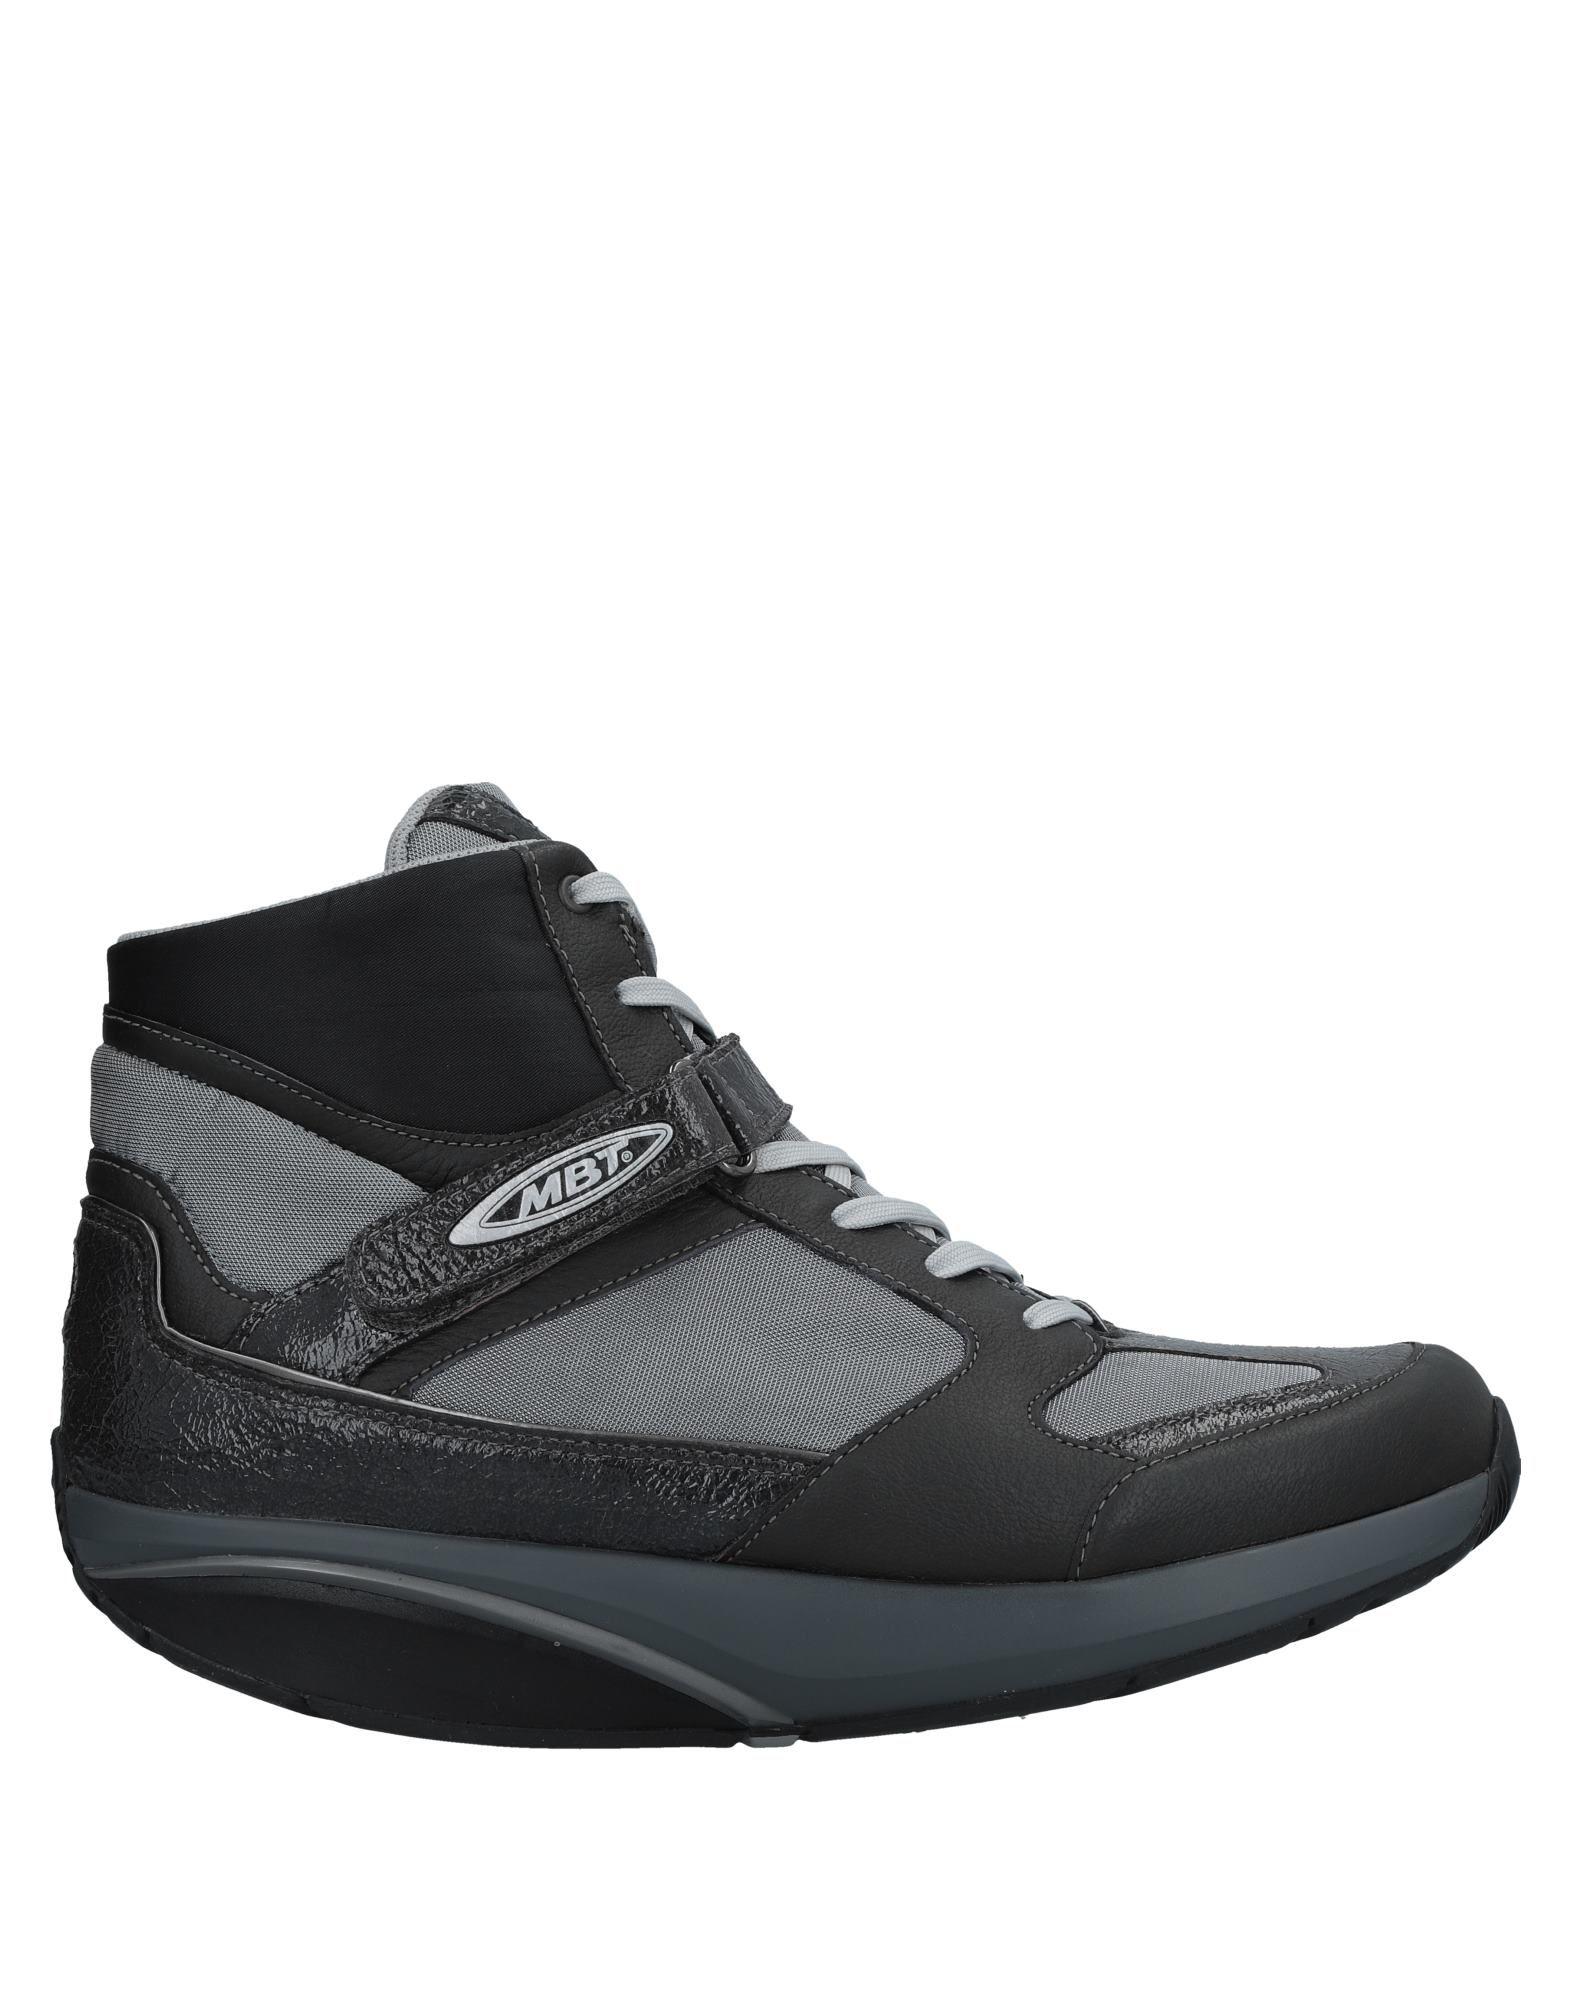 Stilvolle billige Schuhe Mbt Sneakers Damen  11538508LJ